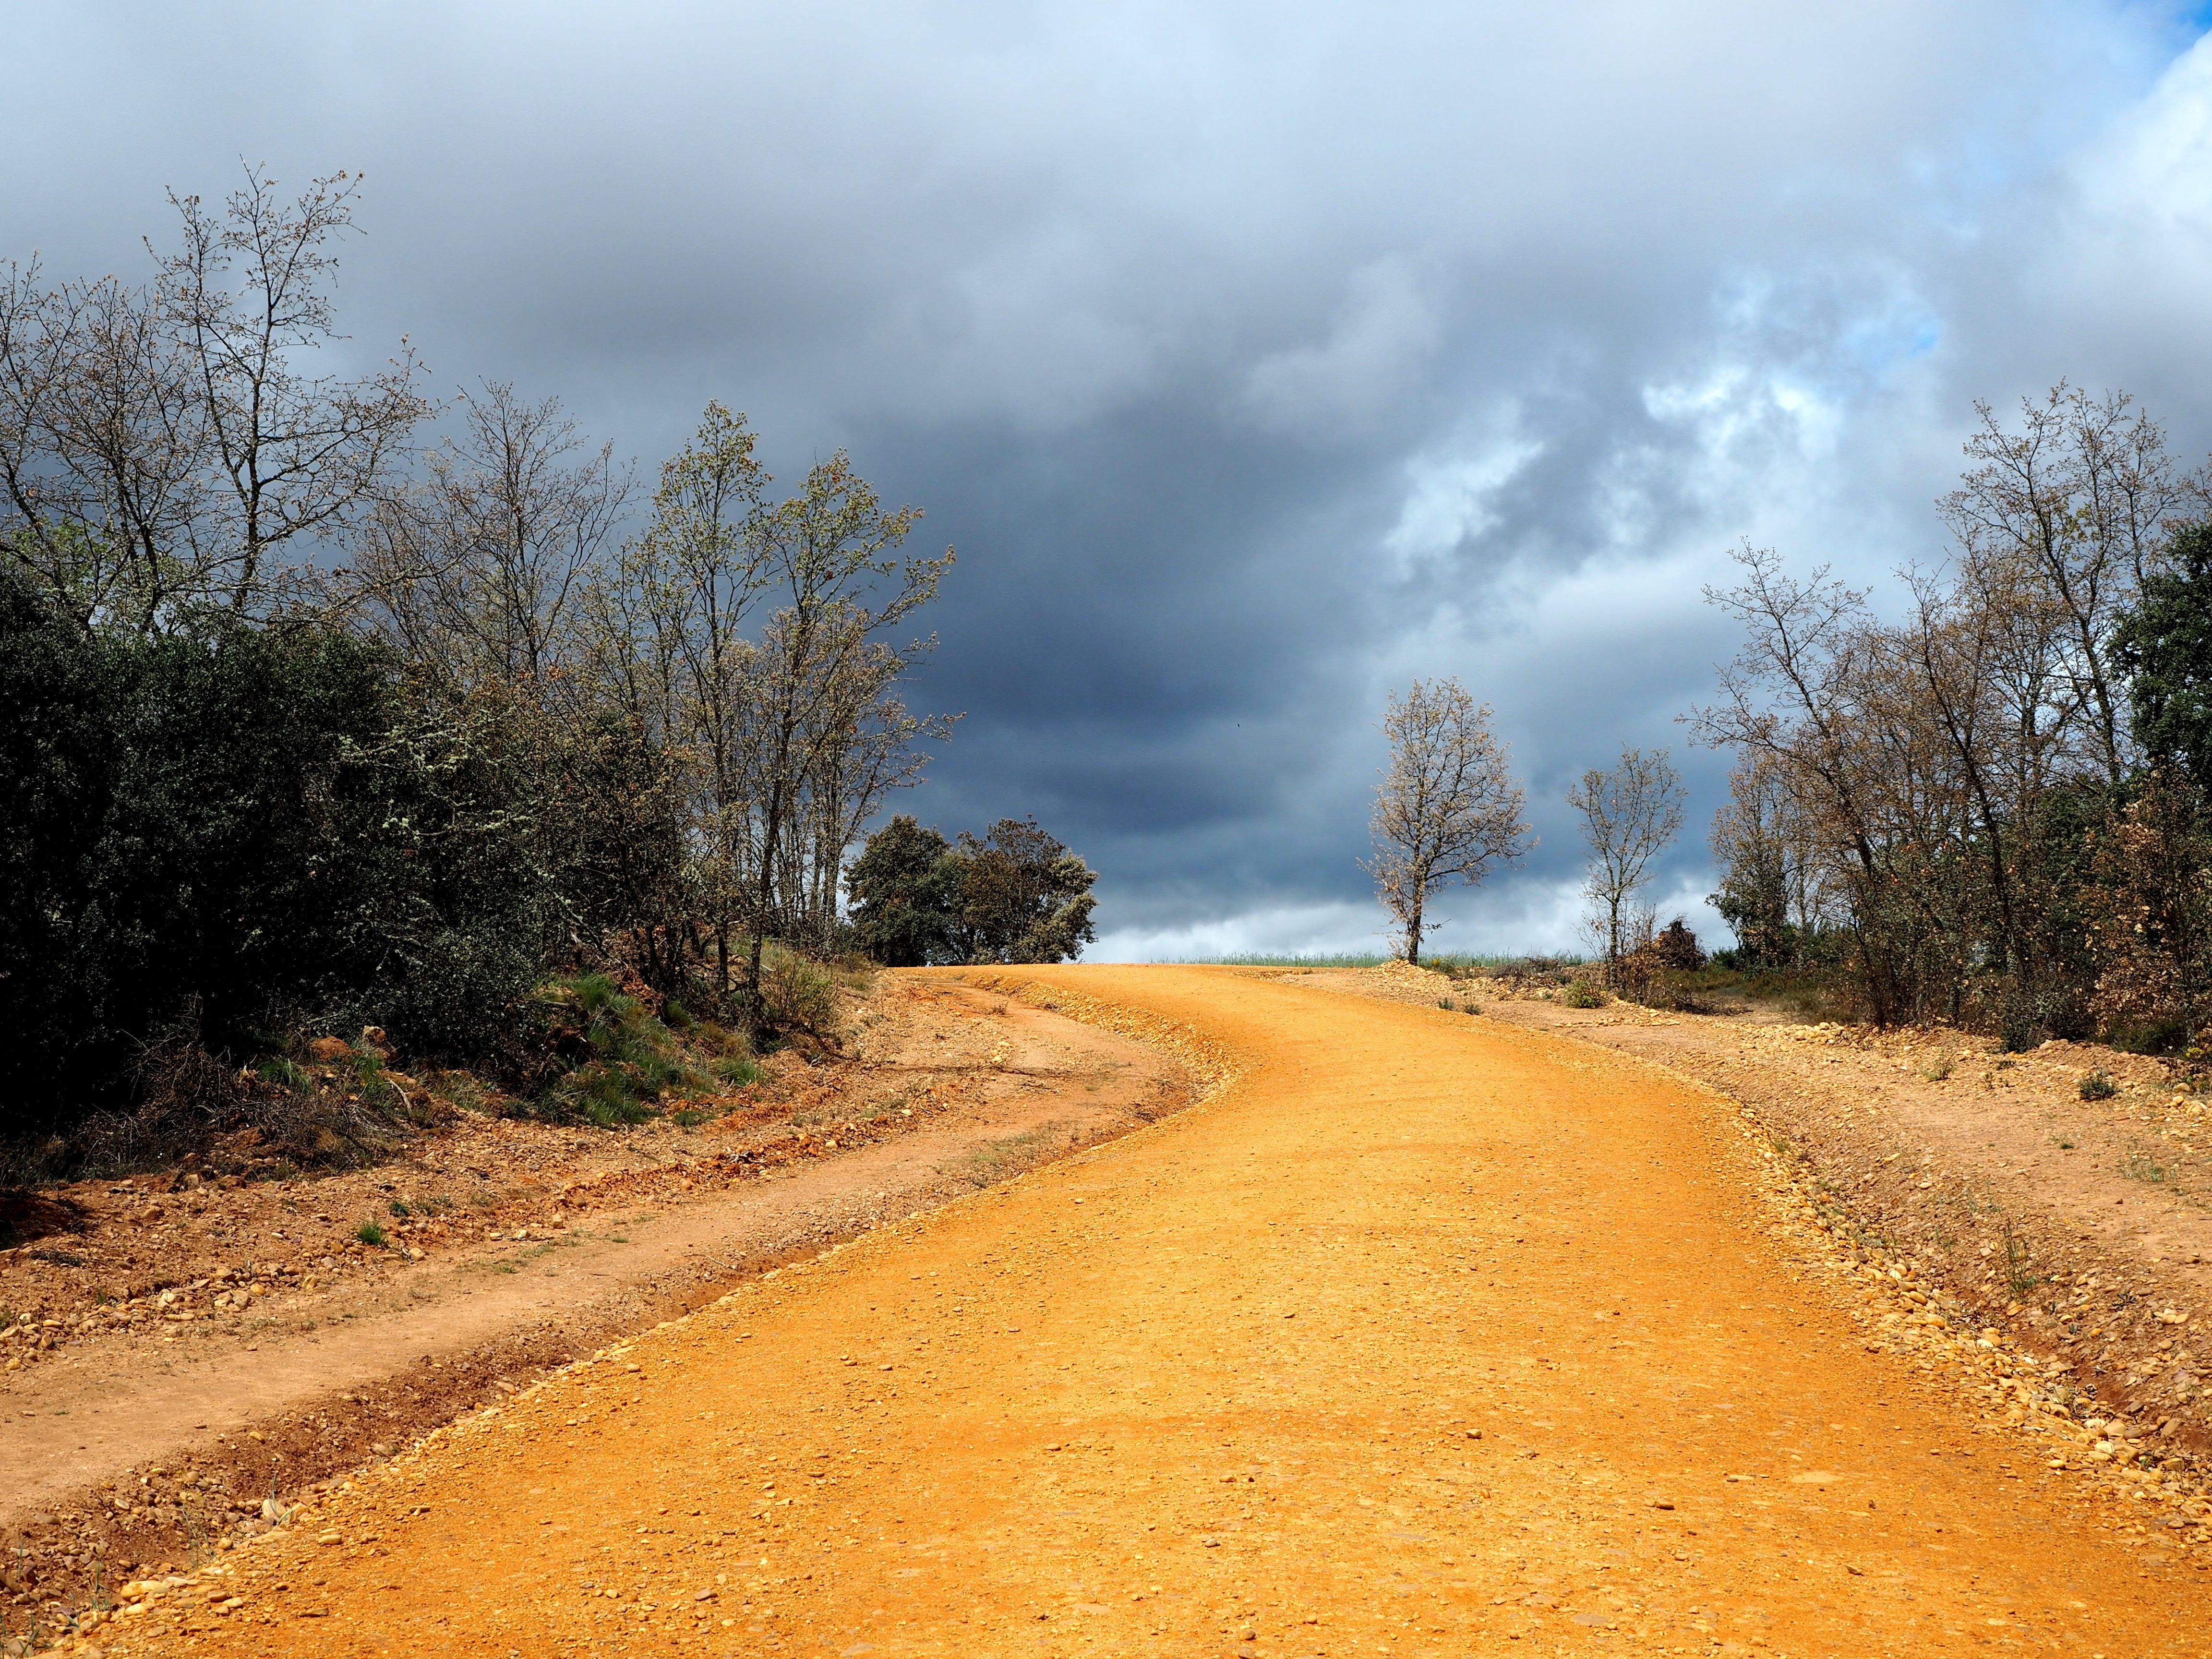 jakobsweg weg himmel natur spanien